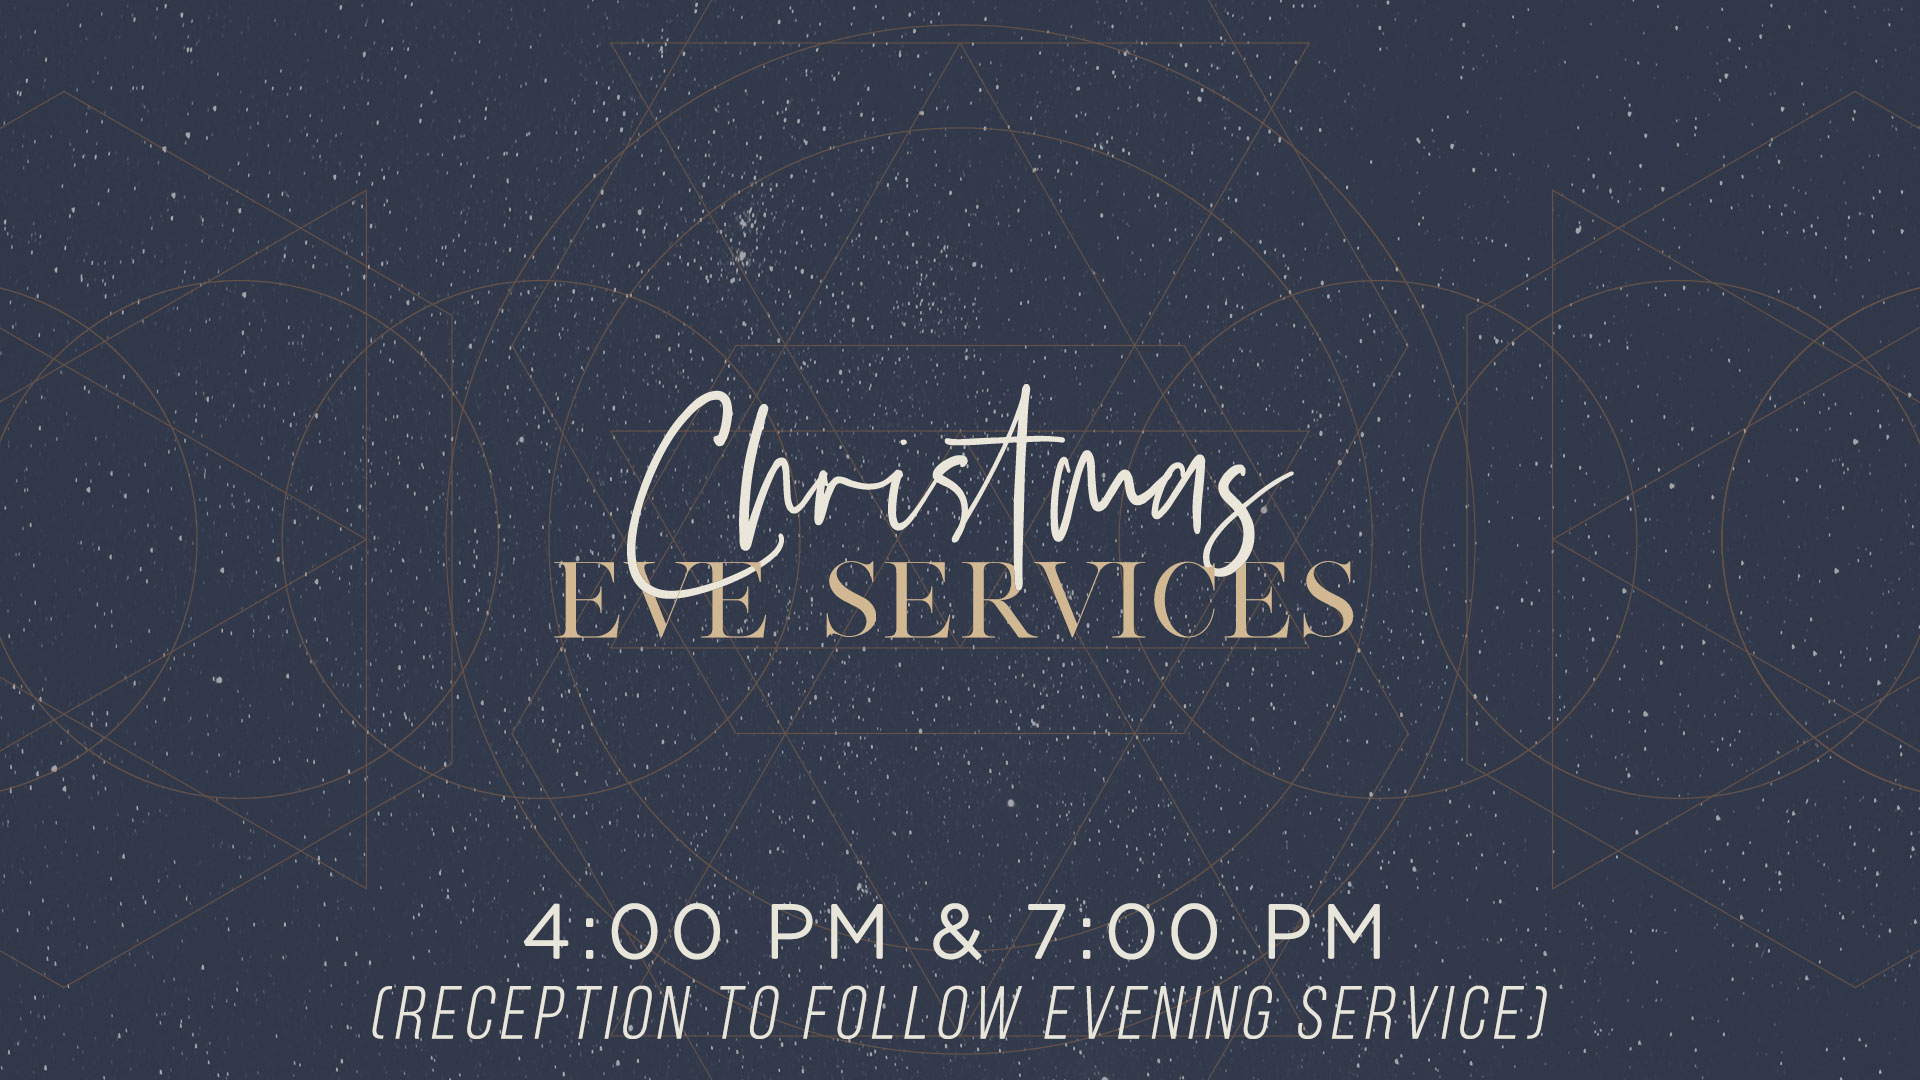 Christmas Eve Services Near Me.Christmas Eve Services Calvary Chapel Stone Mountain